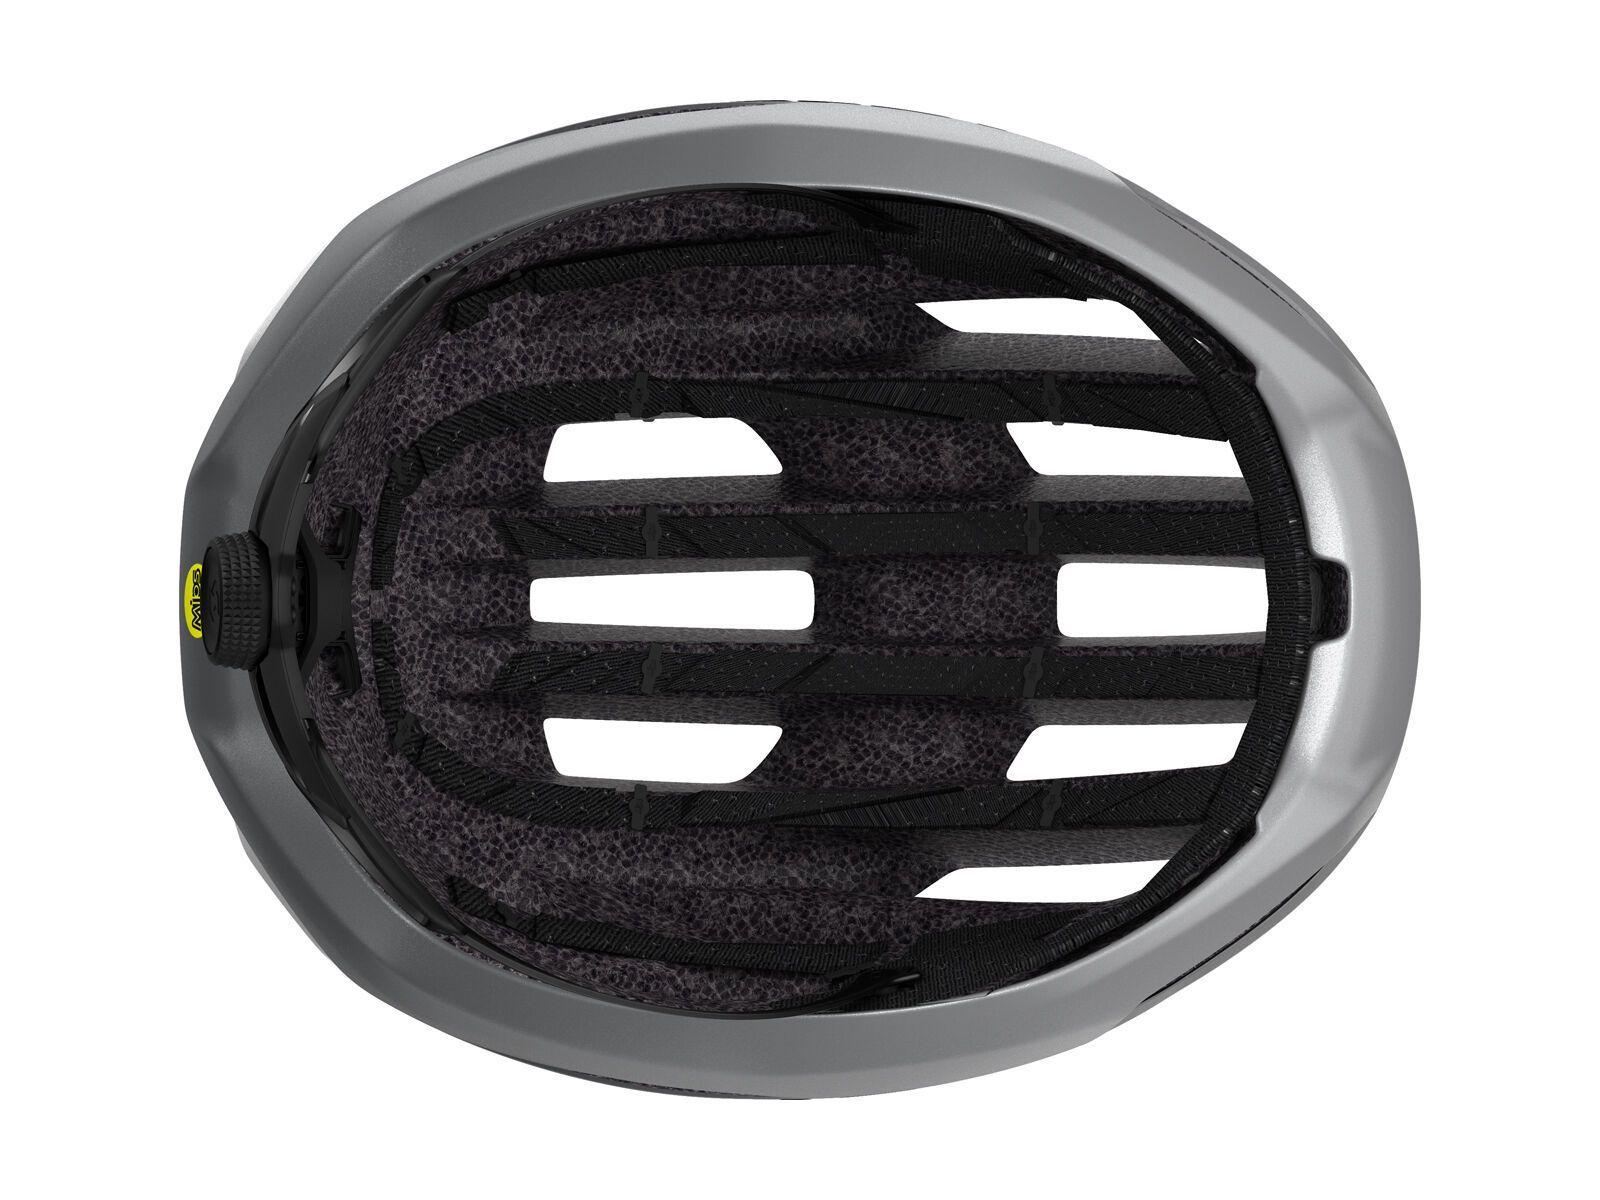 Scott Centric Plus Helmet, vogue silver/reflective | Bild 5